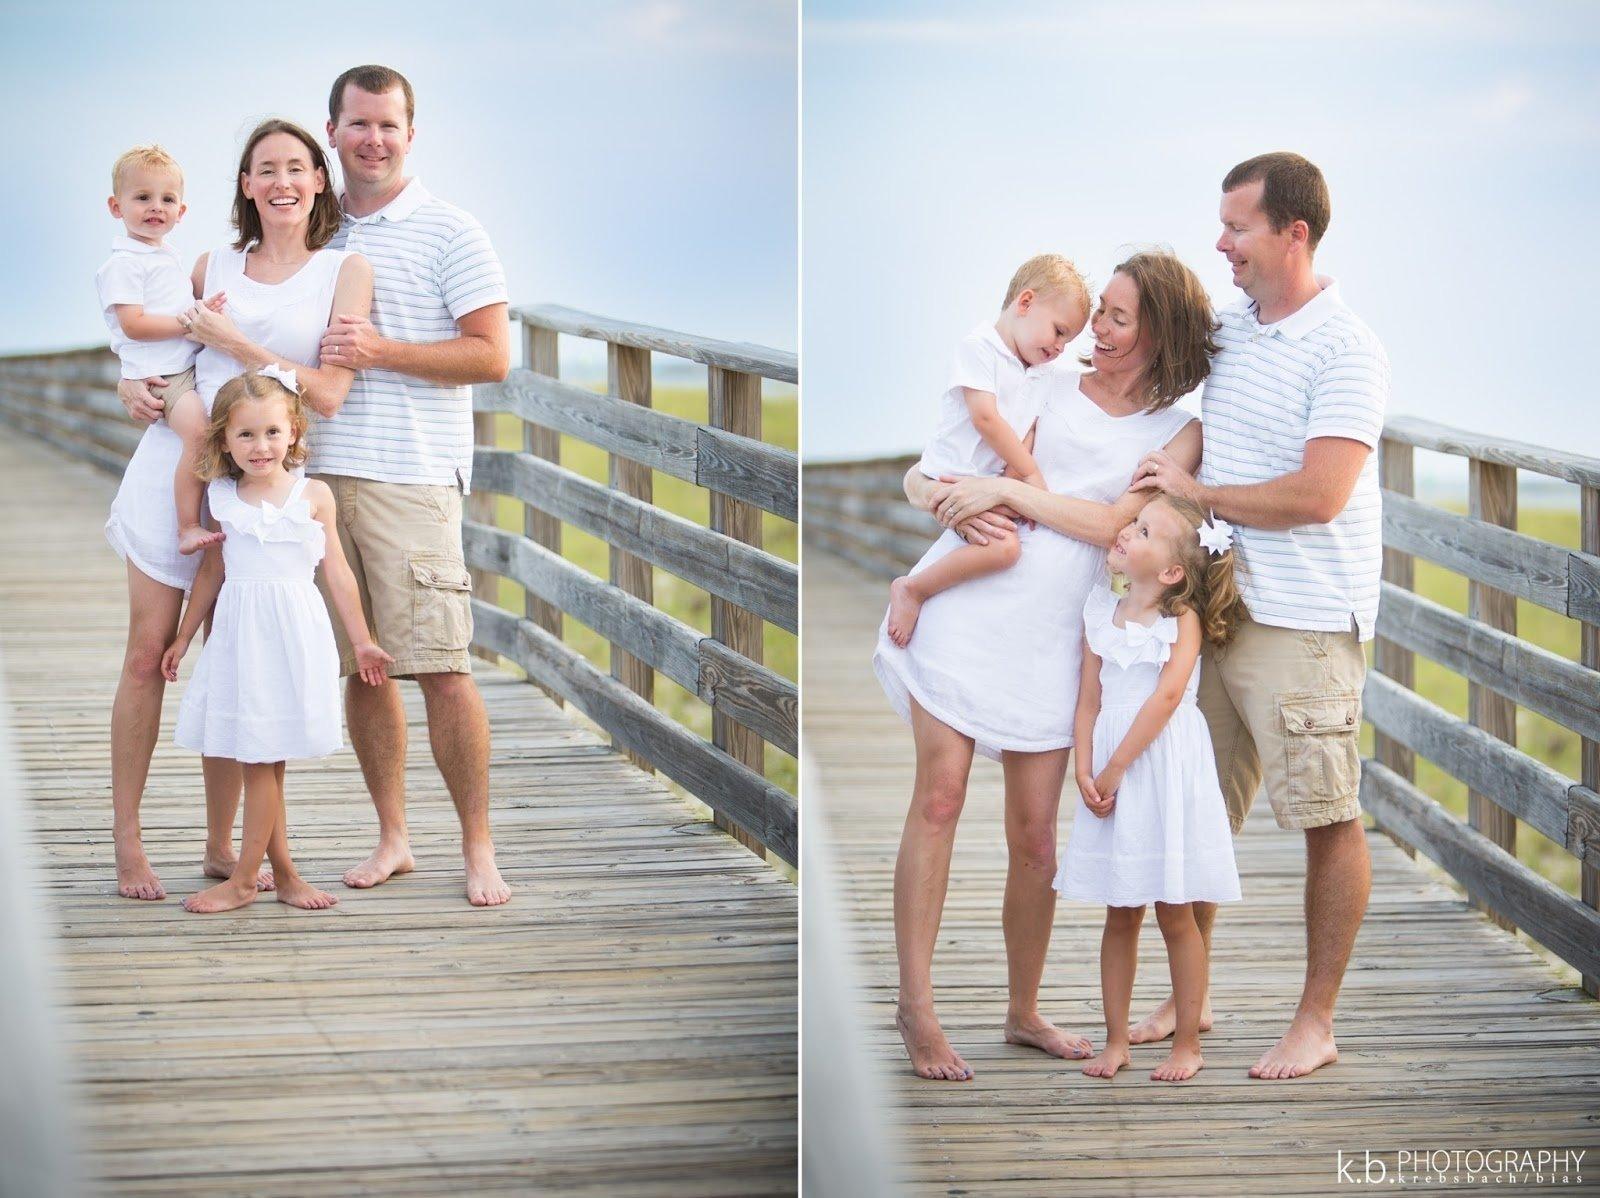 10 Awesome Family Of Four Photo Ideas the rush family e299a5 orange beach alabama photographer k b 1 2021